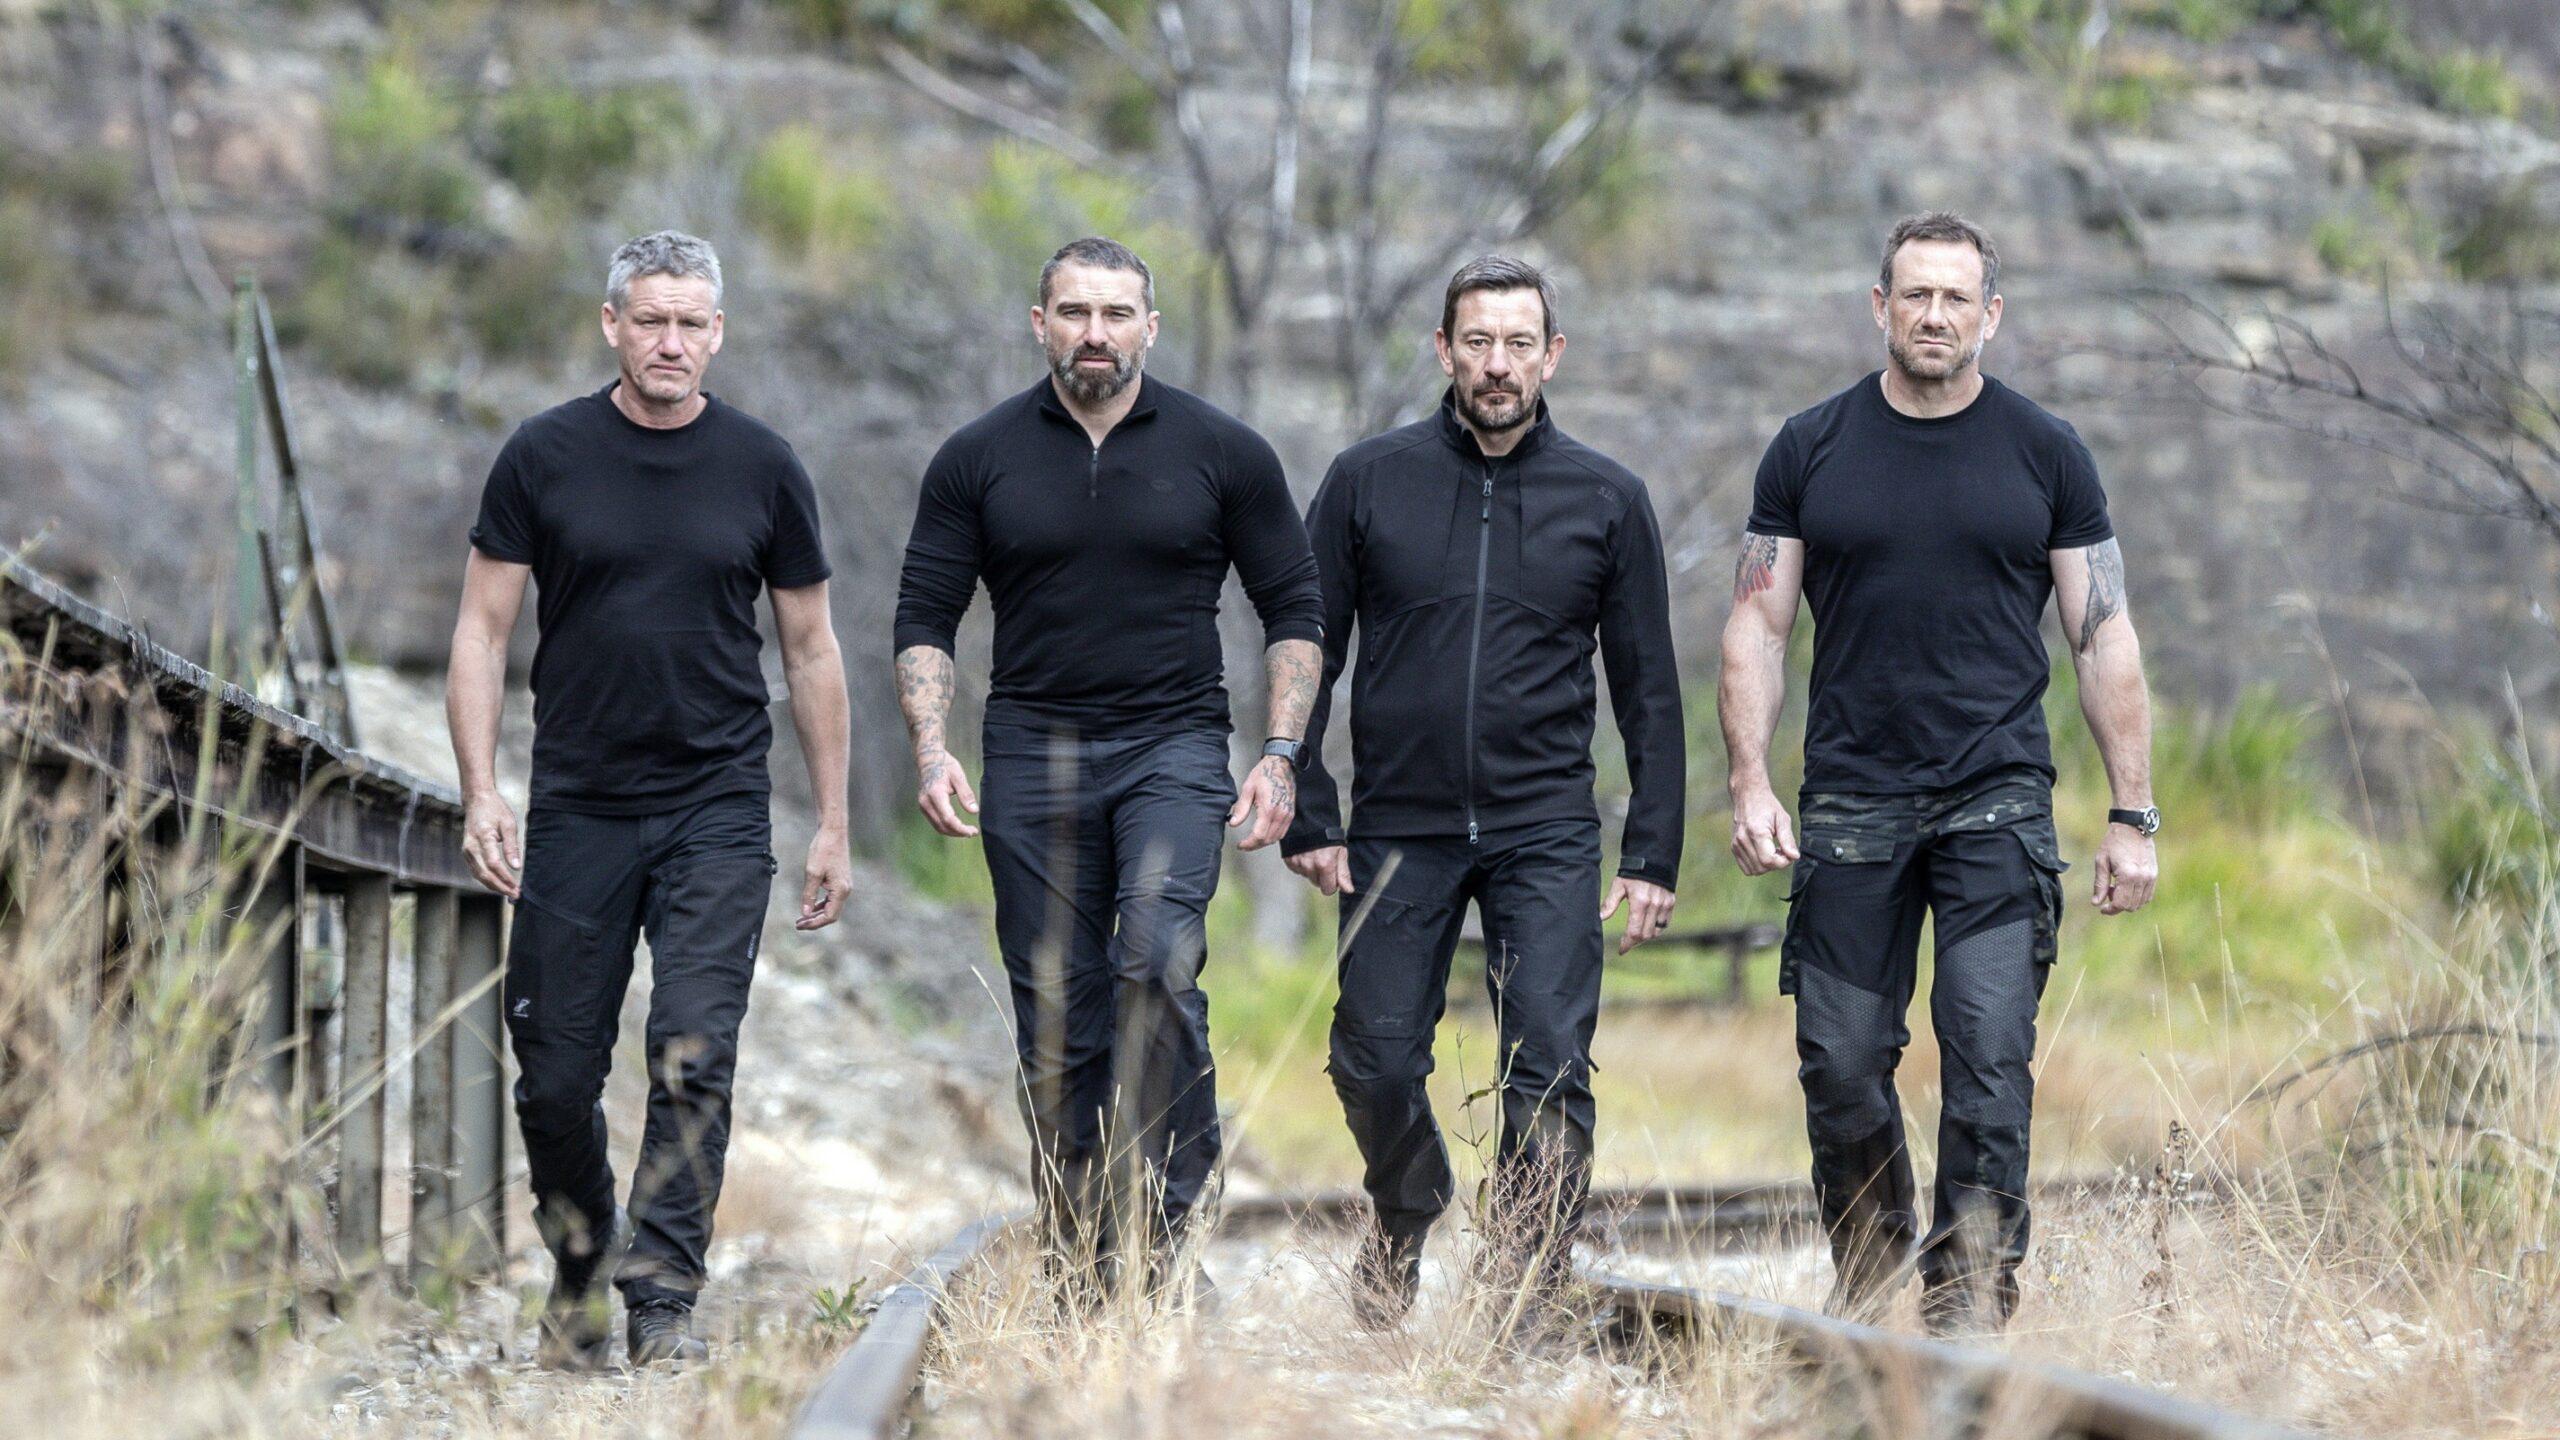 TV's toughest test is back with SAS Australia